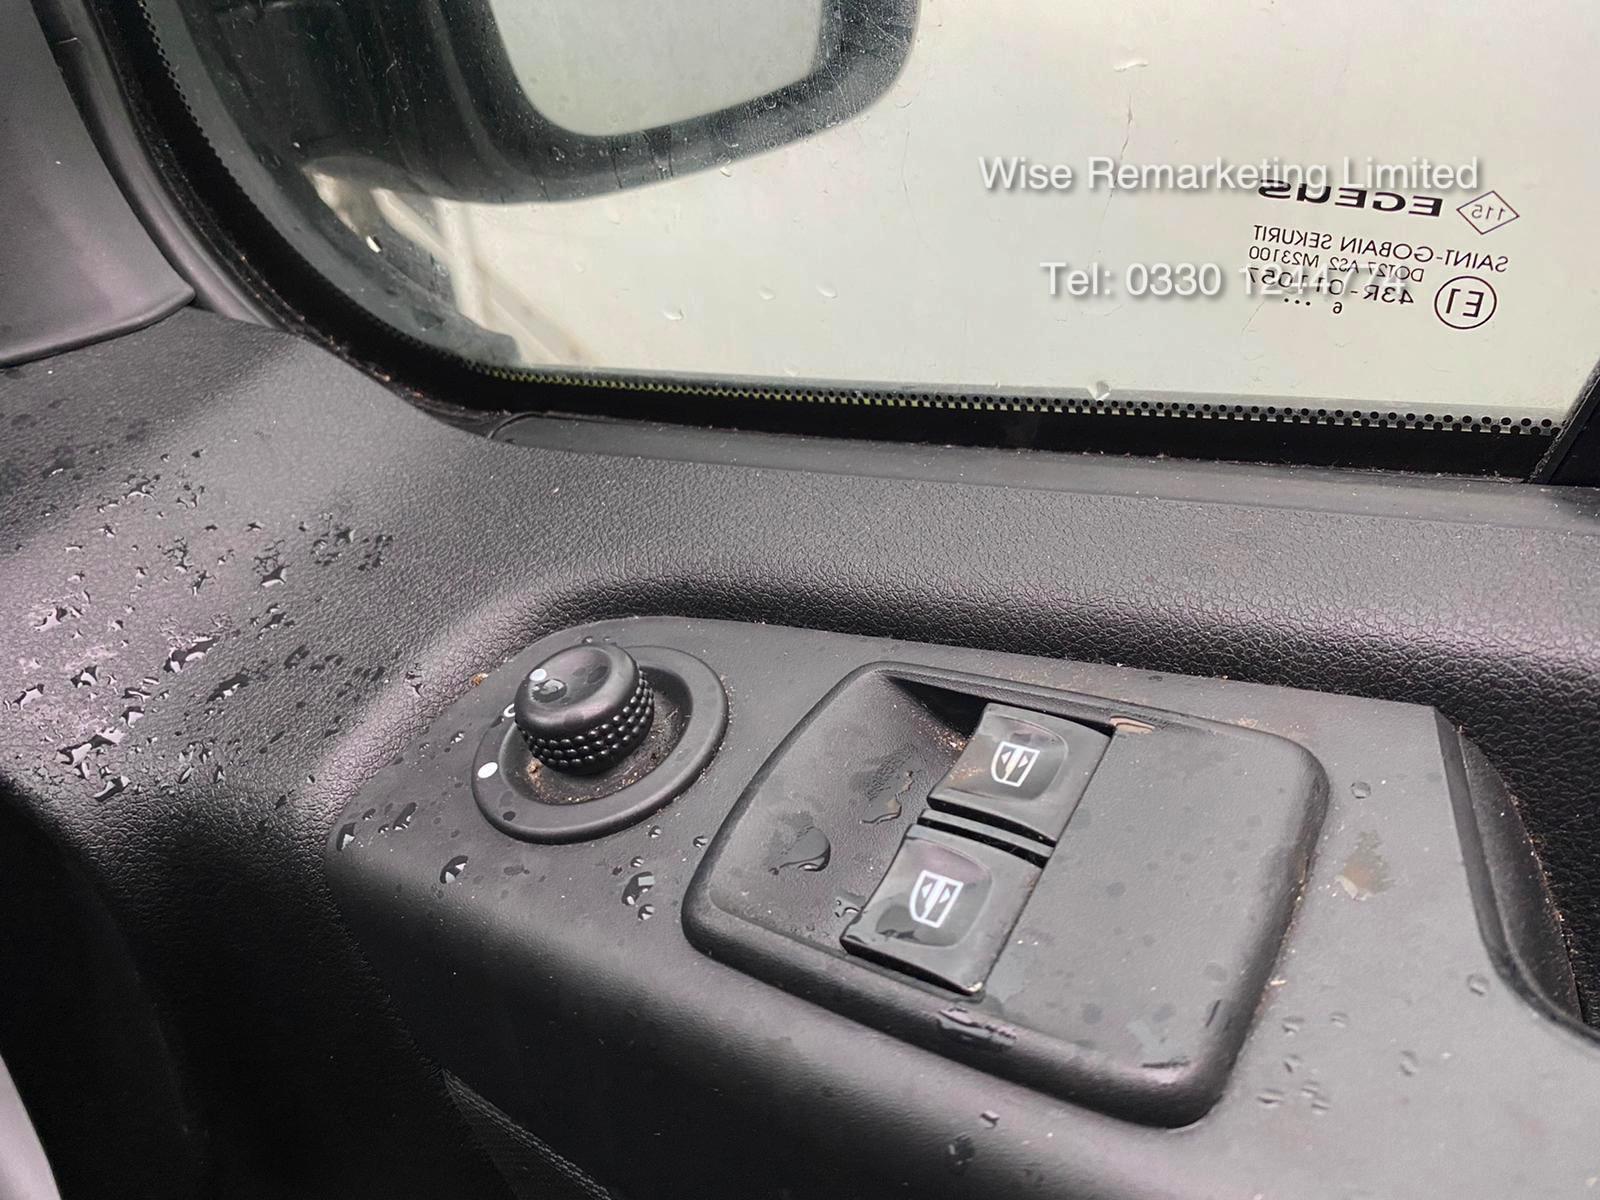 Vauxhall Vivaro 2700 Sportive 1.6 CDTI - 2017 Reg - Parking Sensors - Air Con - - Image 6 of 11